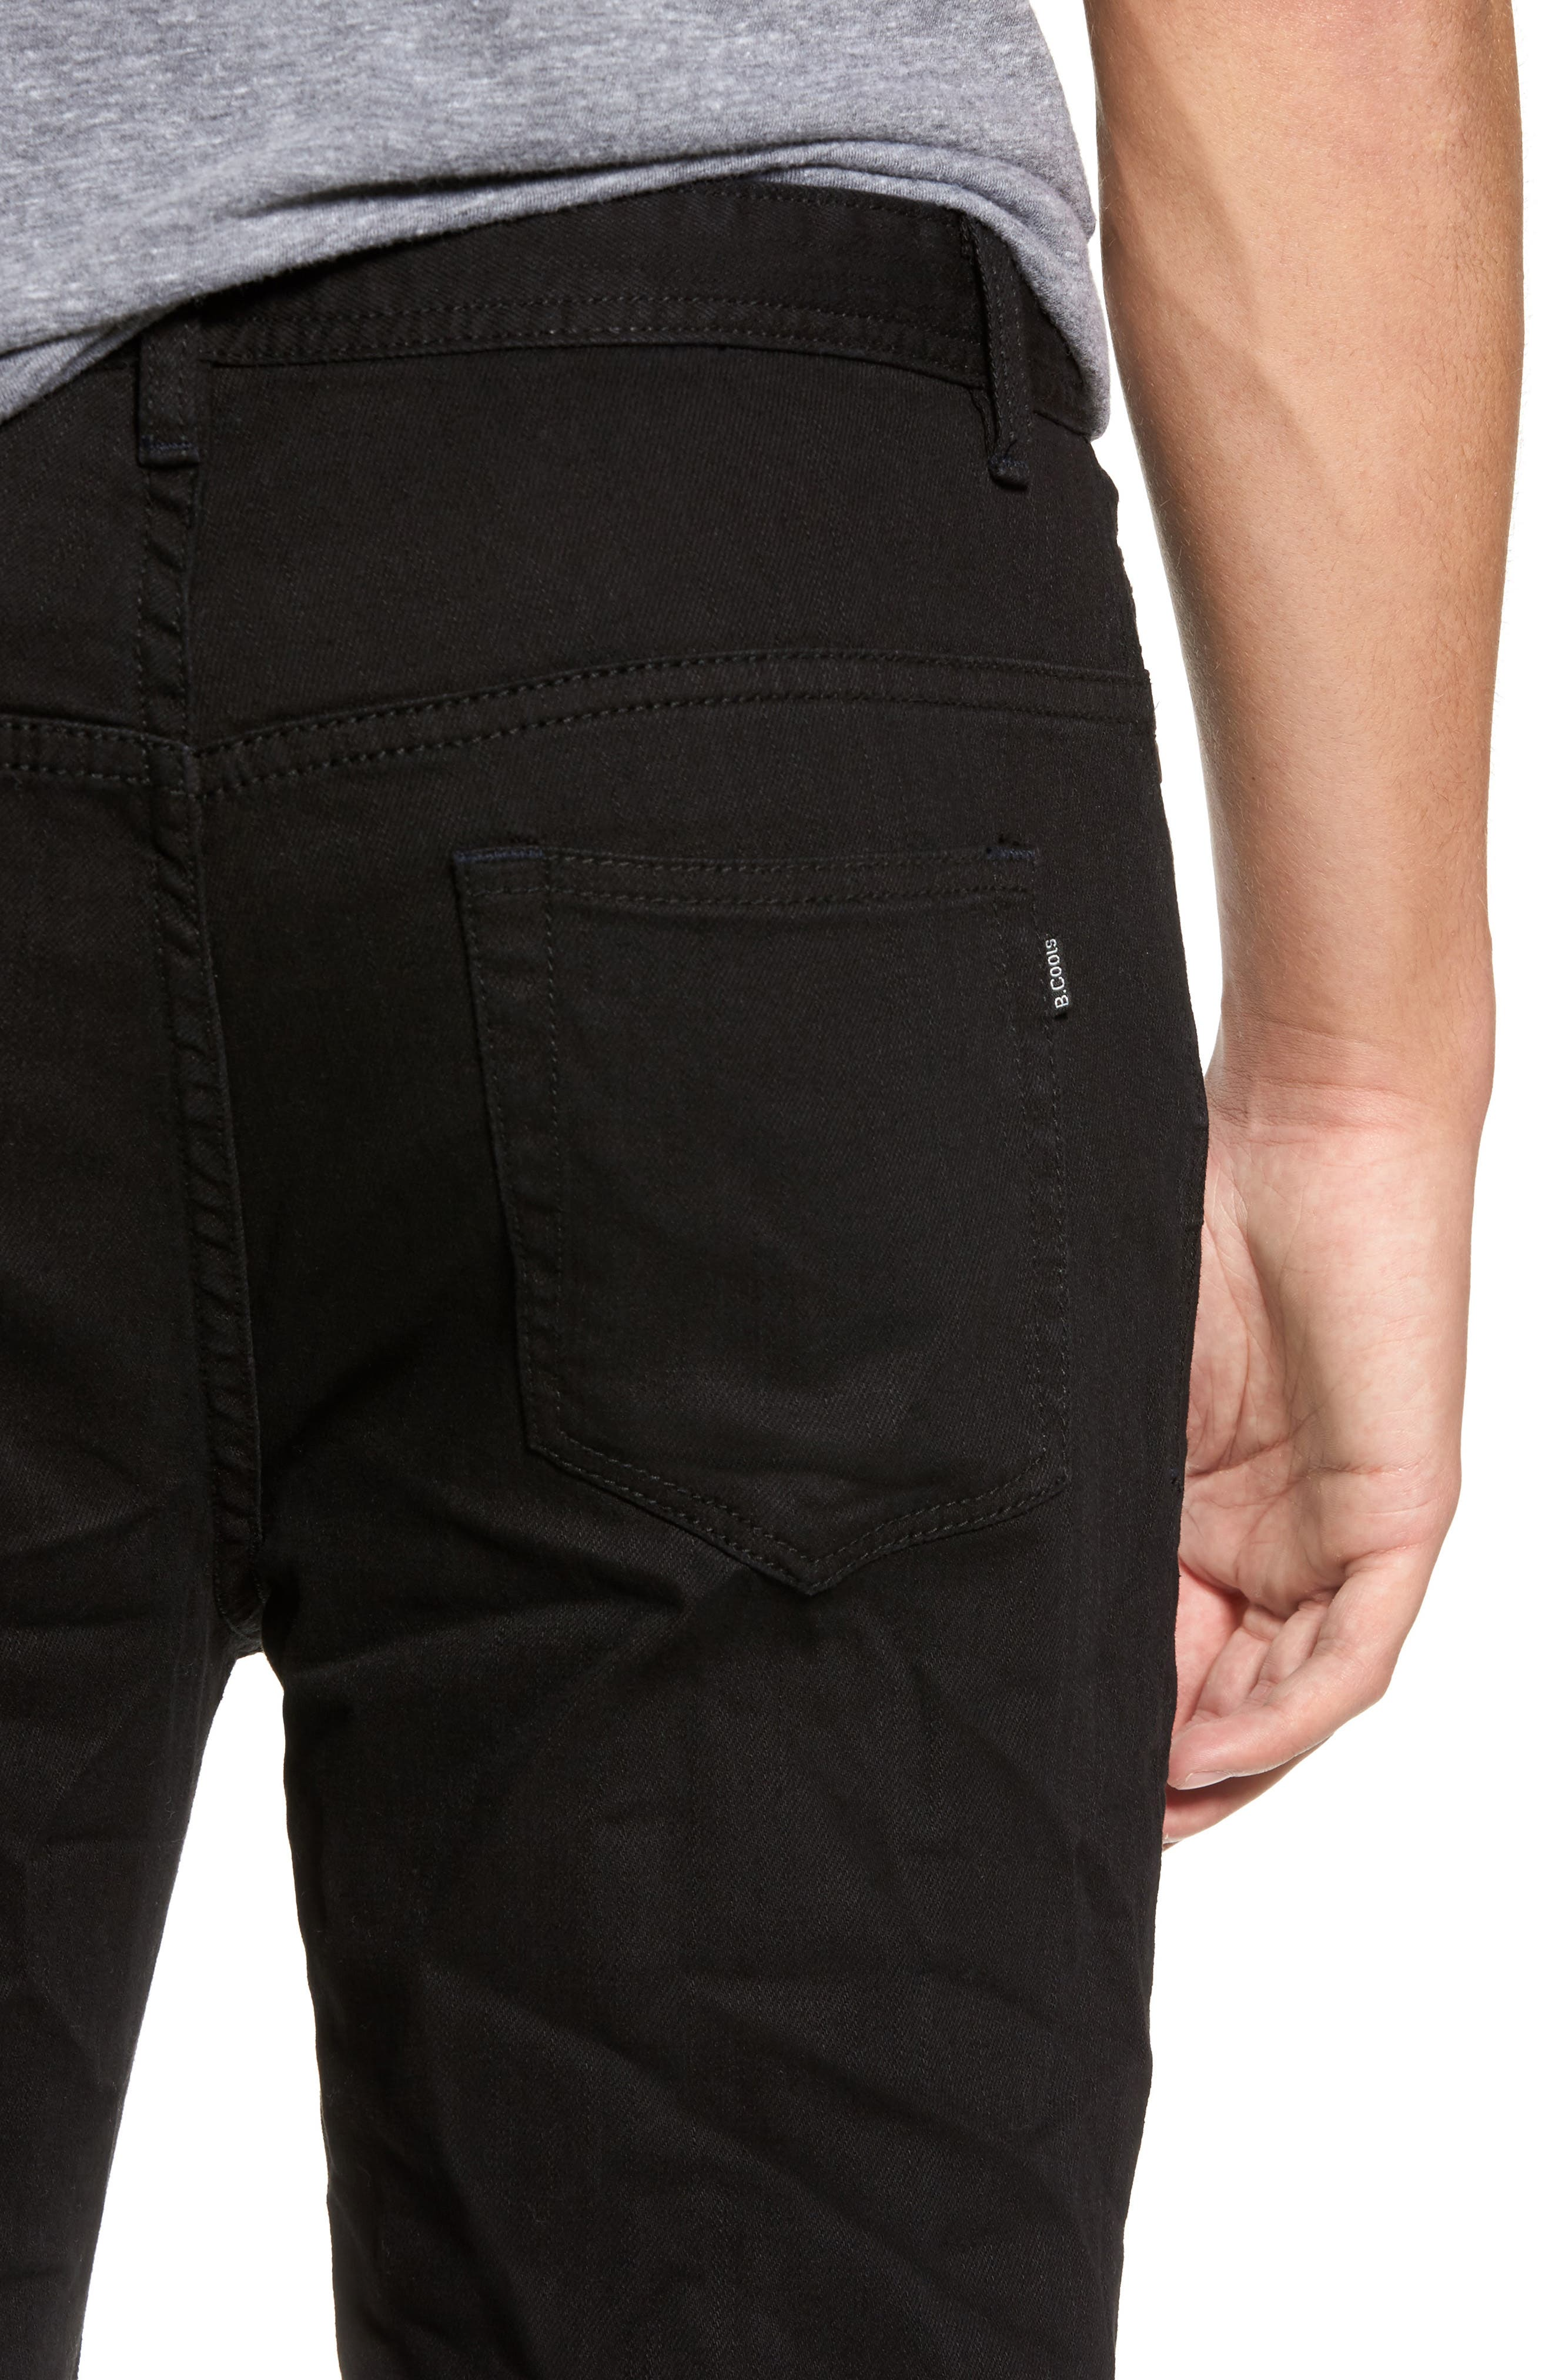 B.Line Crop Slim Fit Jeans,                             Alternate thumbnail 4, color,                             Washed Black